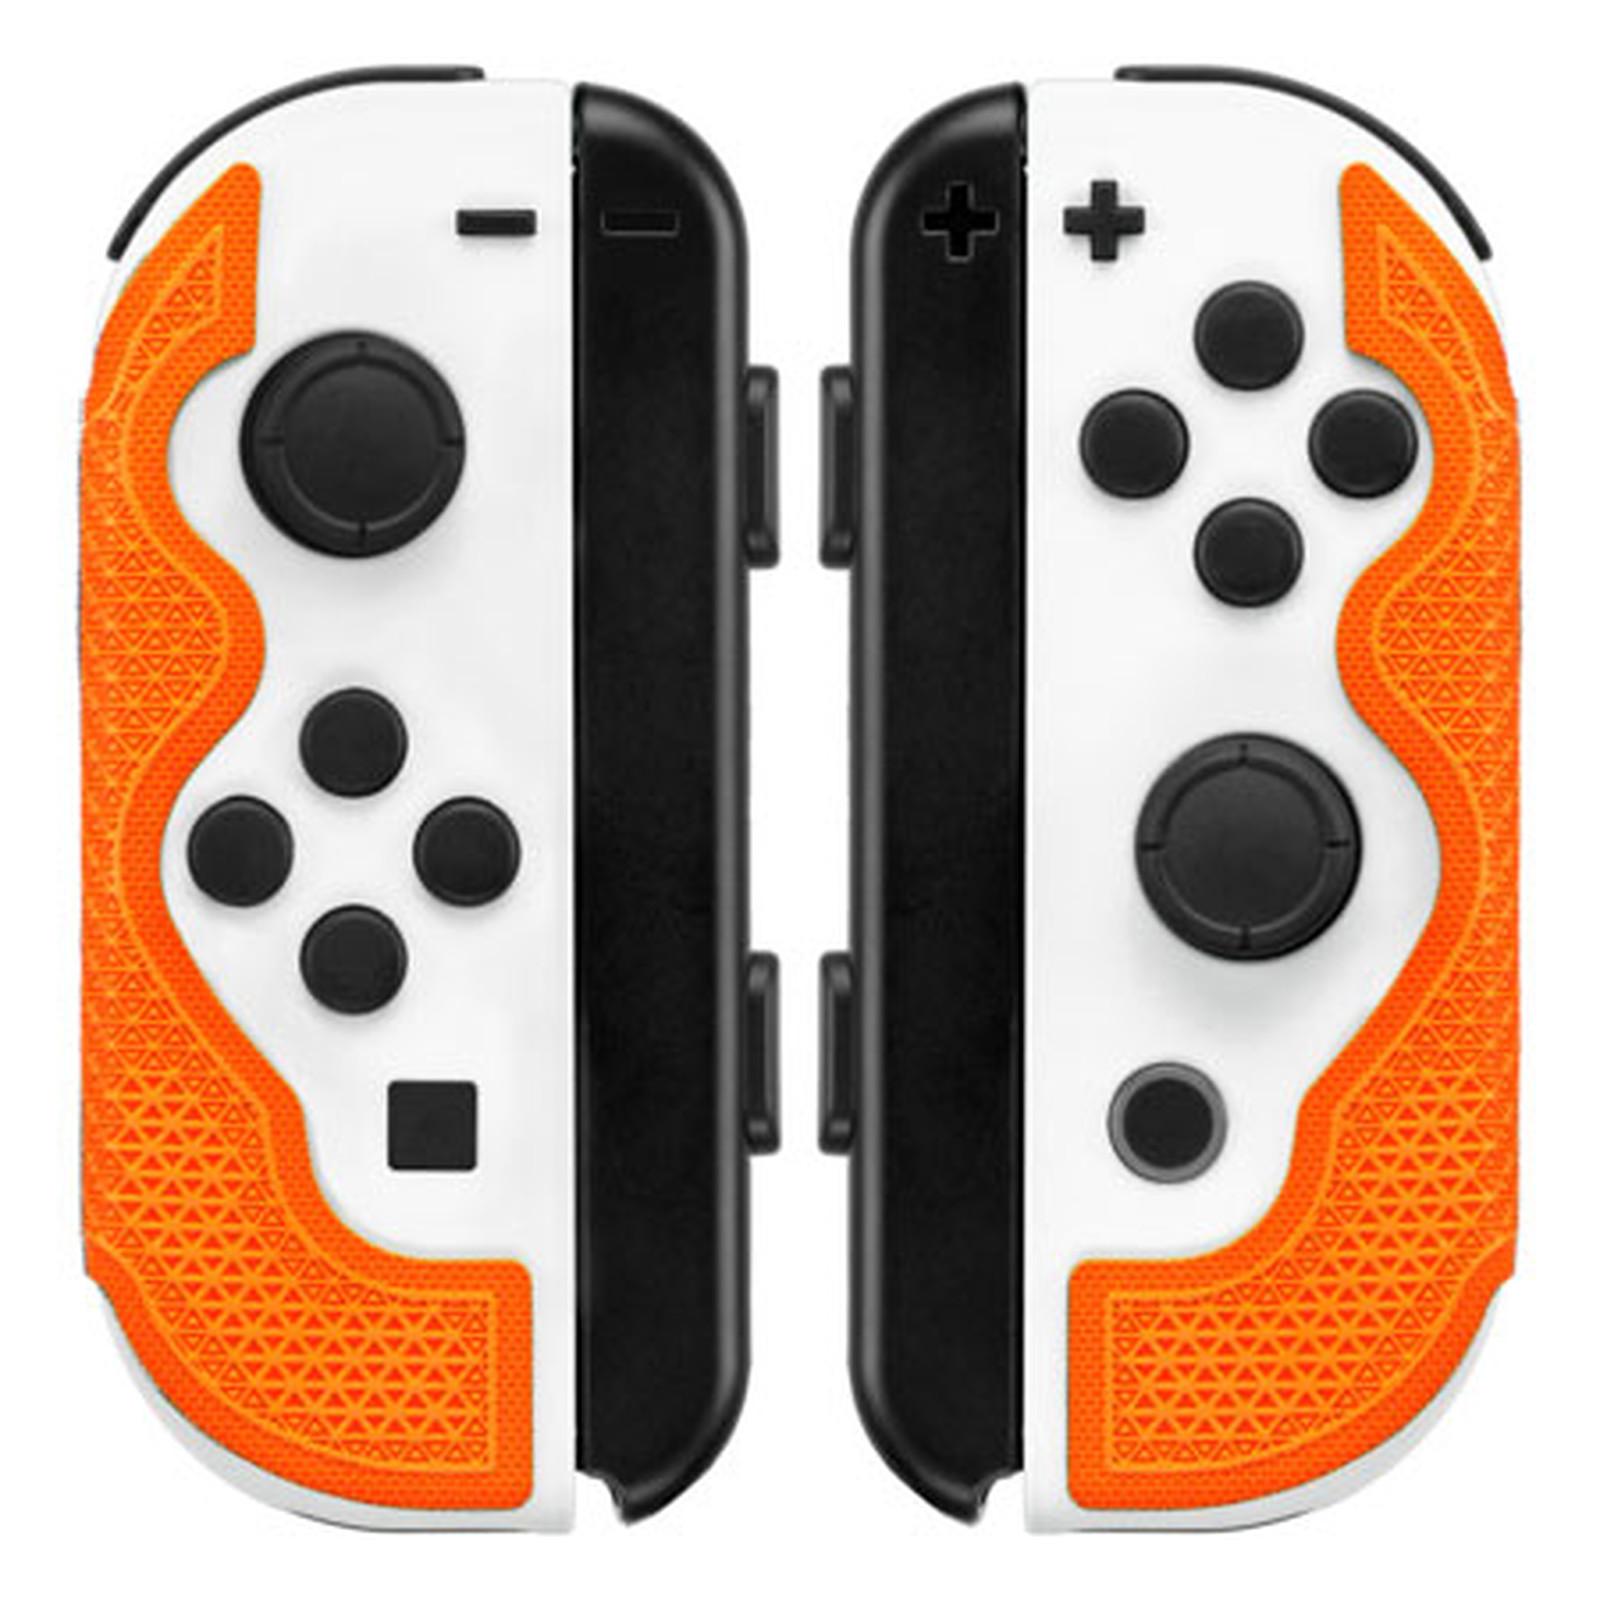 Lizard Skins DSP Controller Grip Nintendo Switch (Orange)